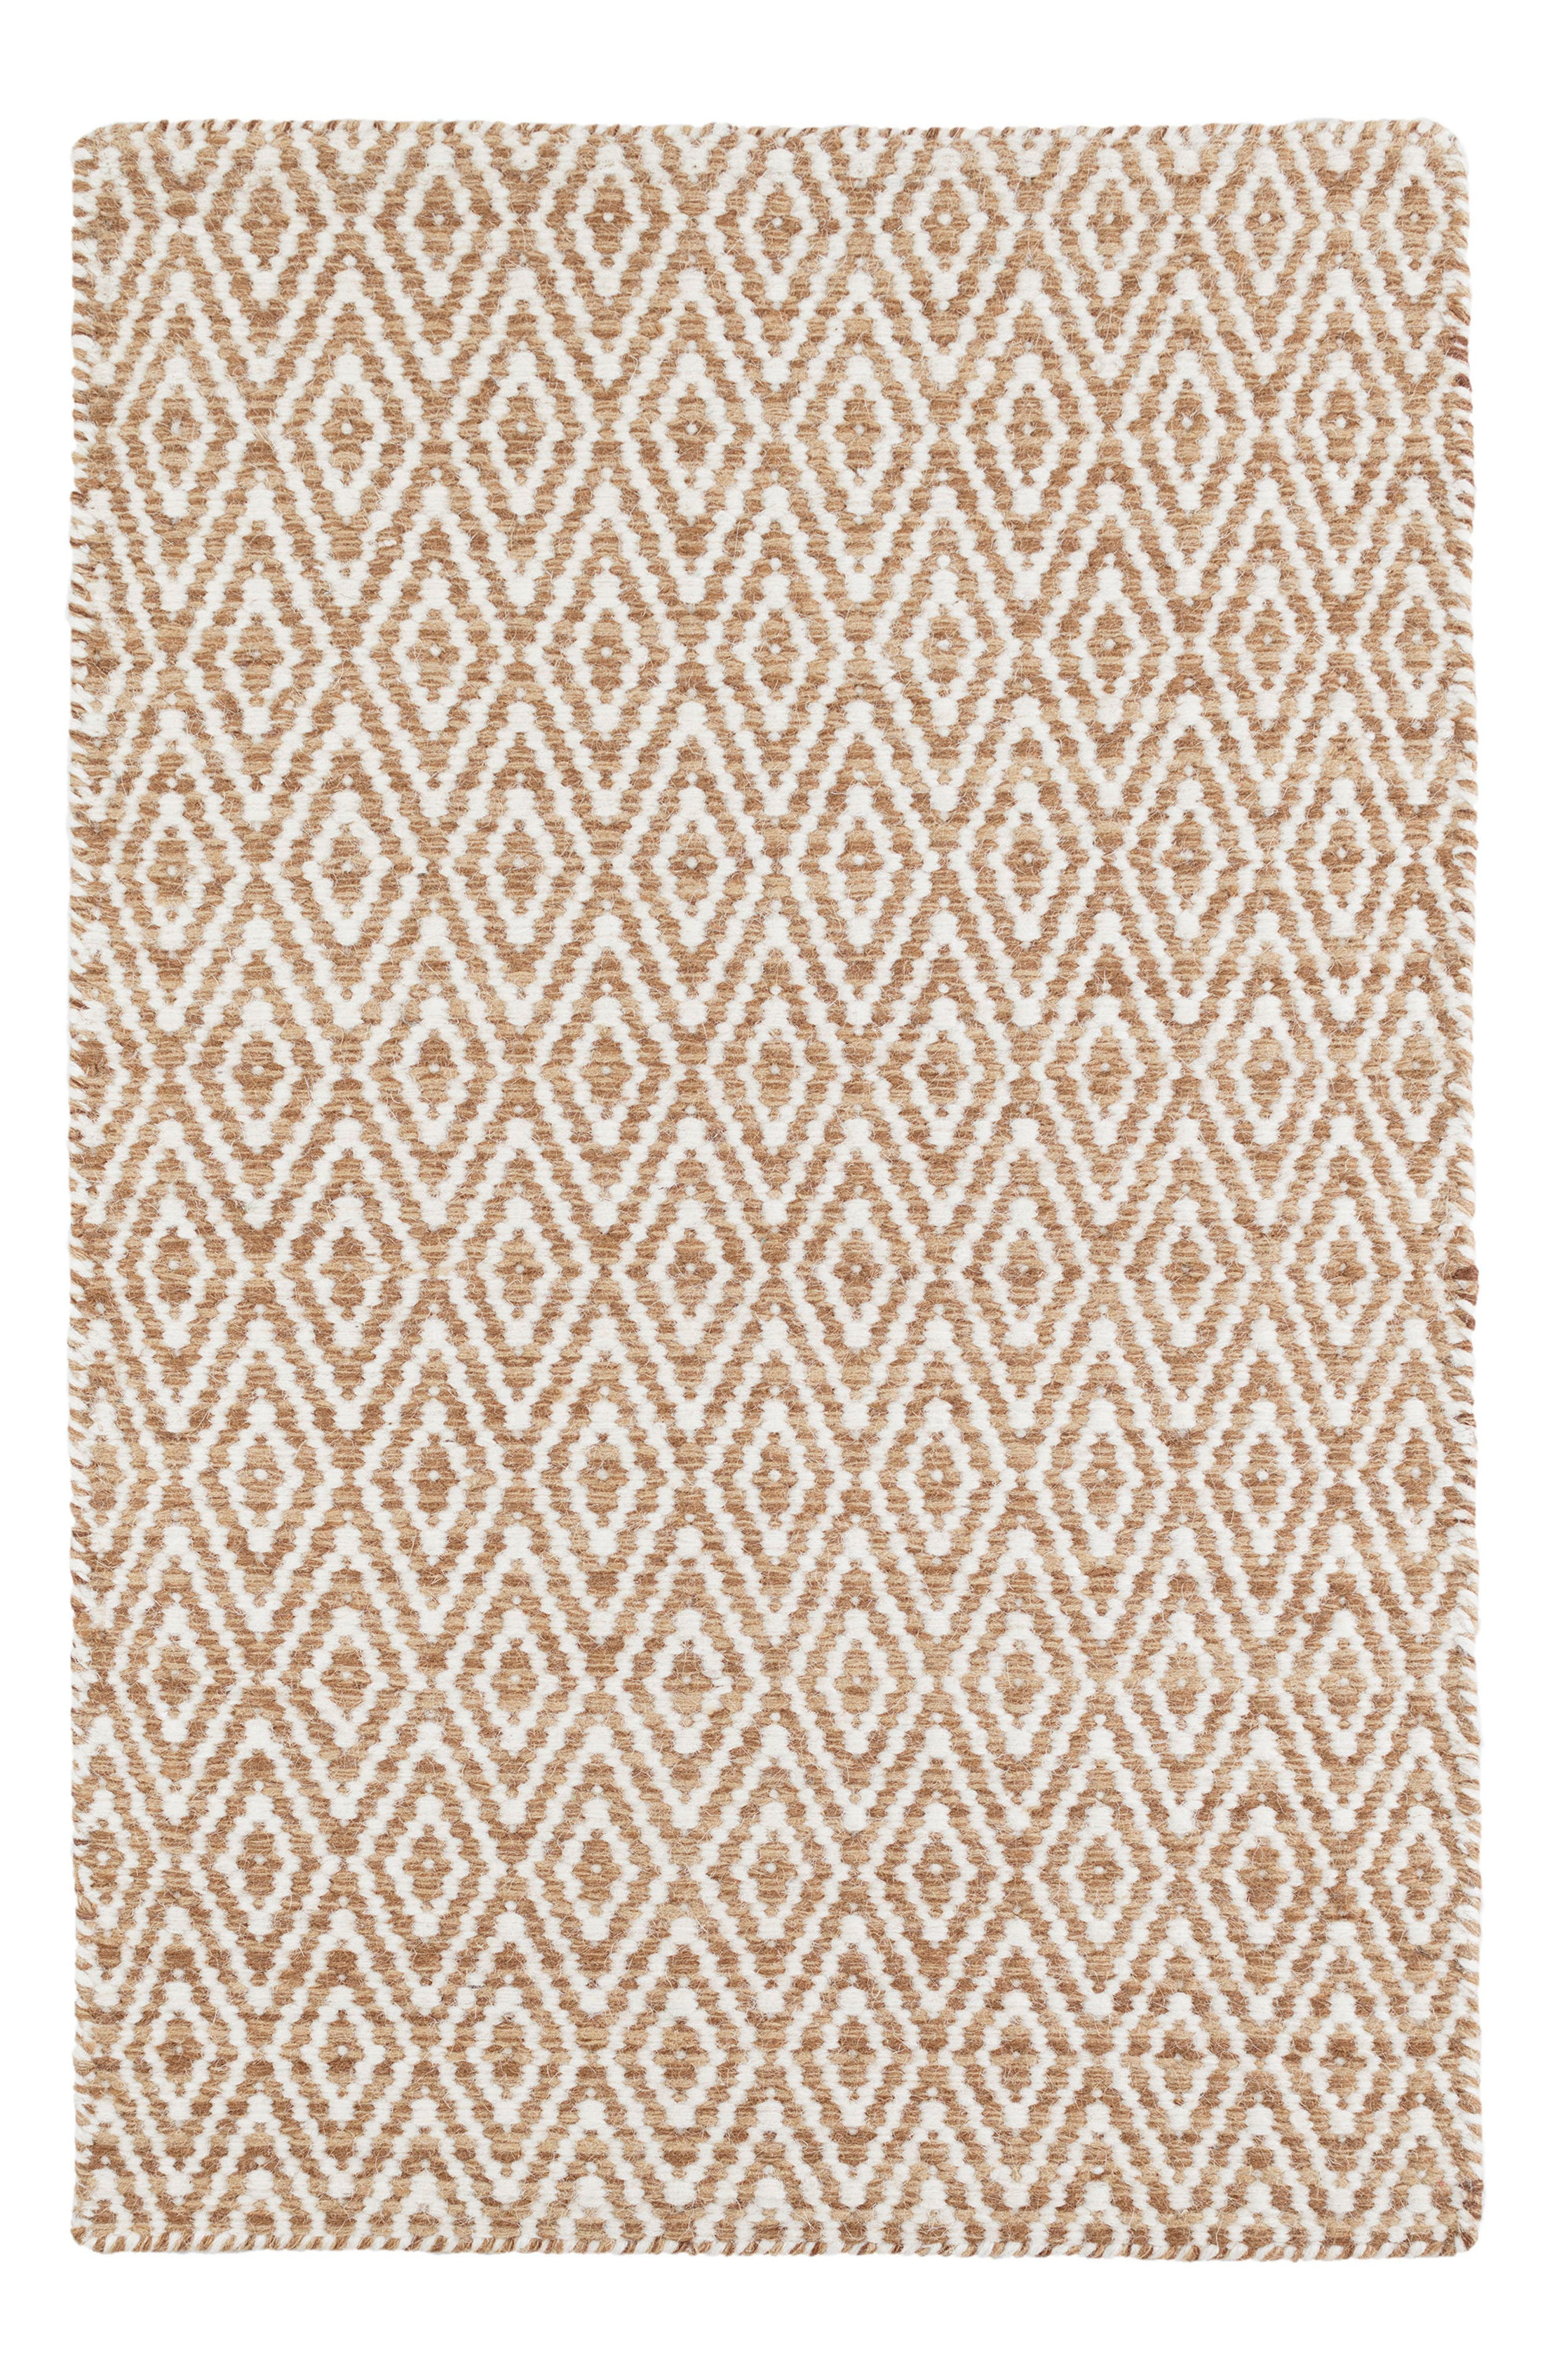 Rhodes Woven Rug,                             Main thumbnail 1, color,                             250